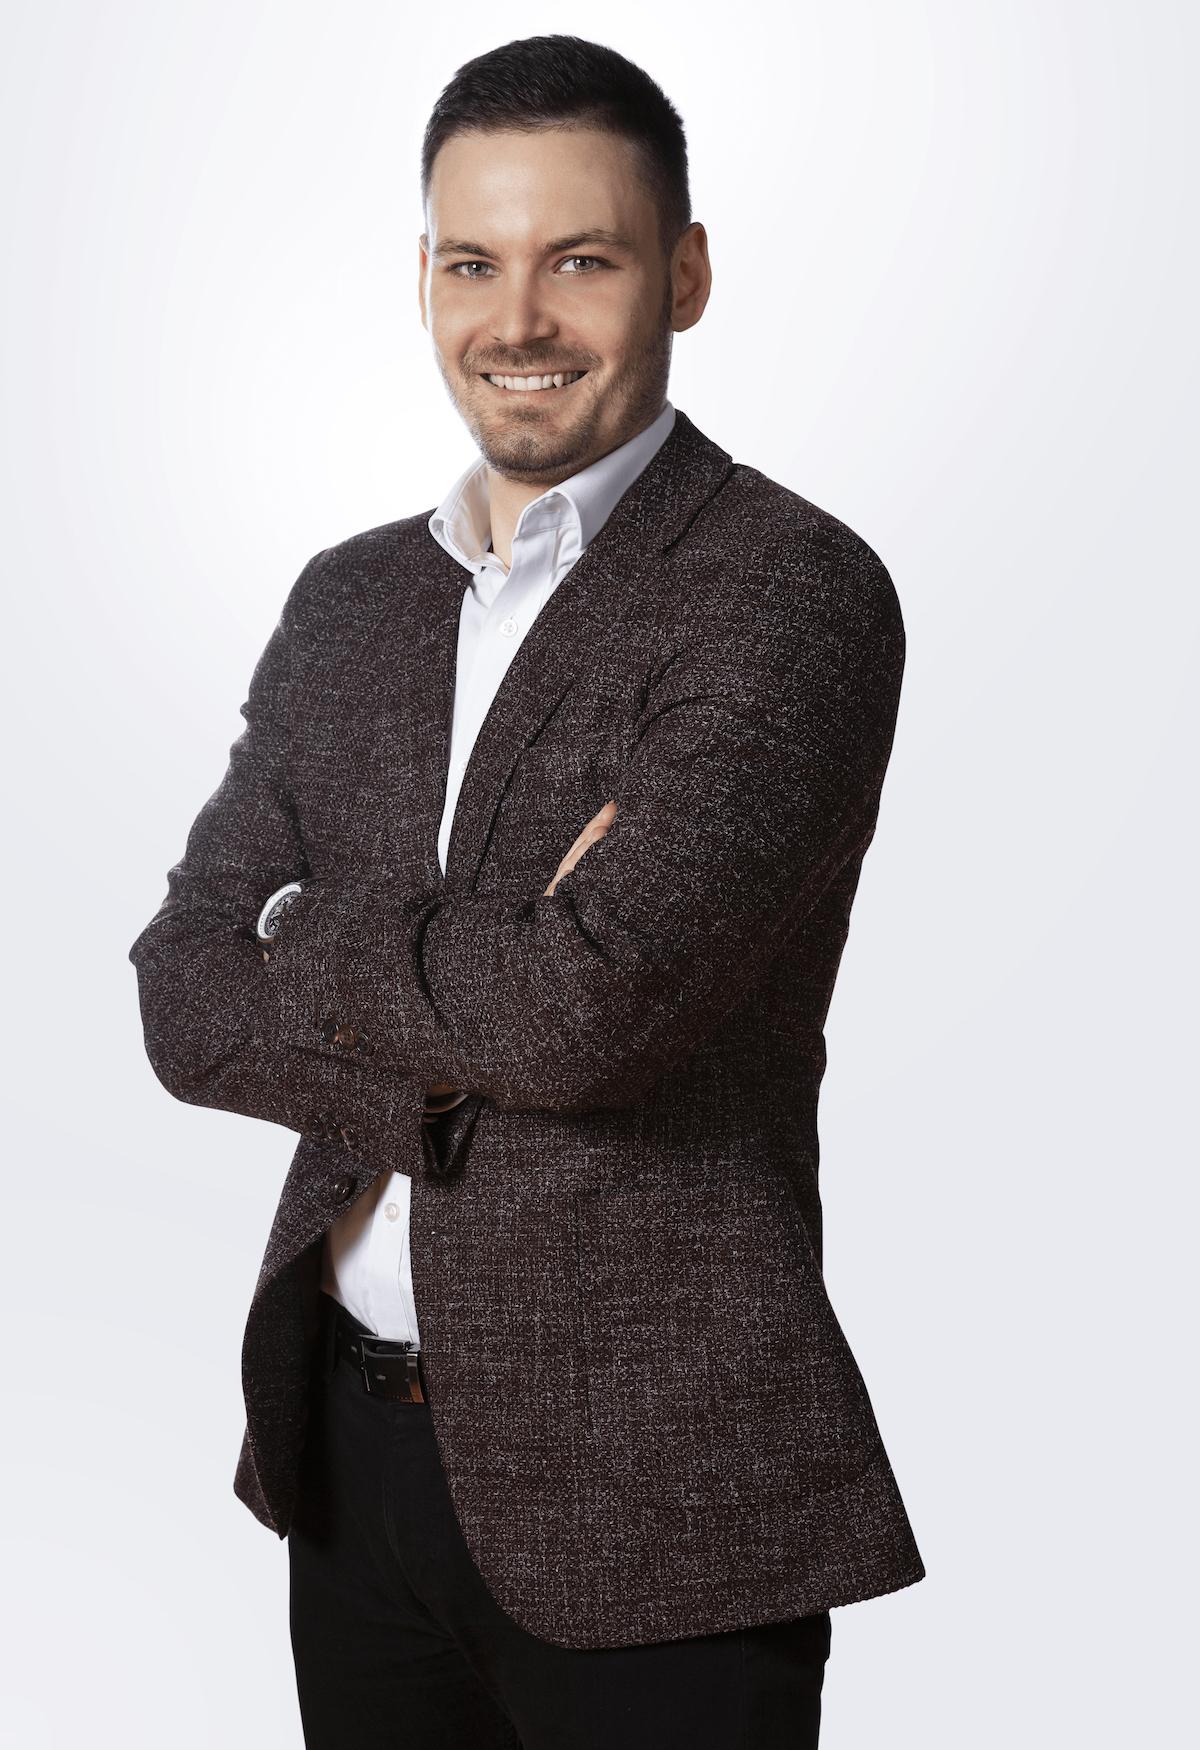 Michal Majnuš